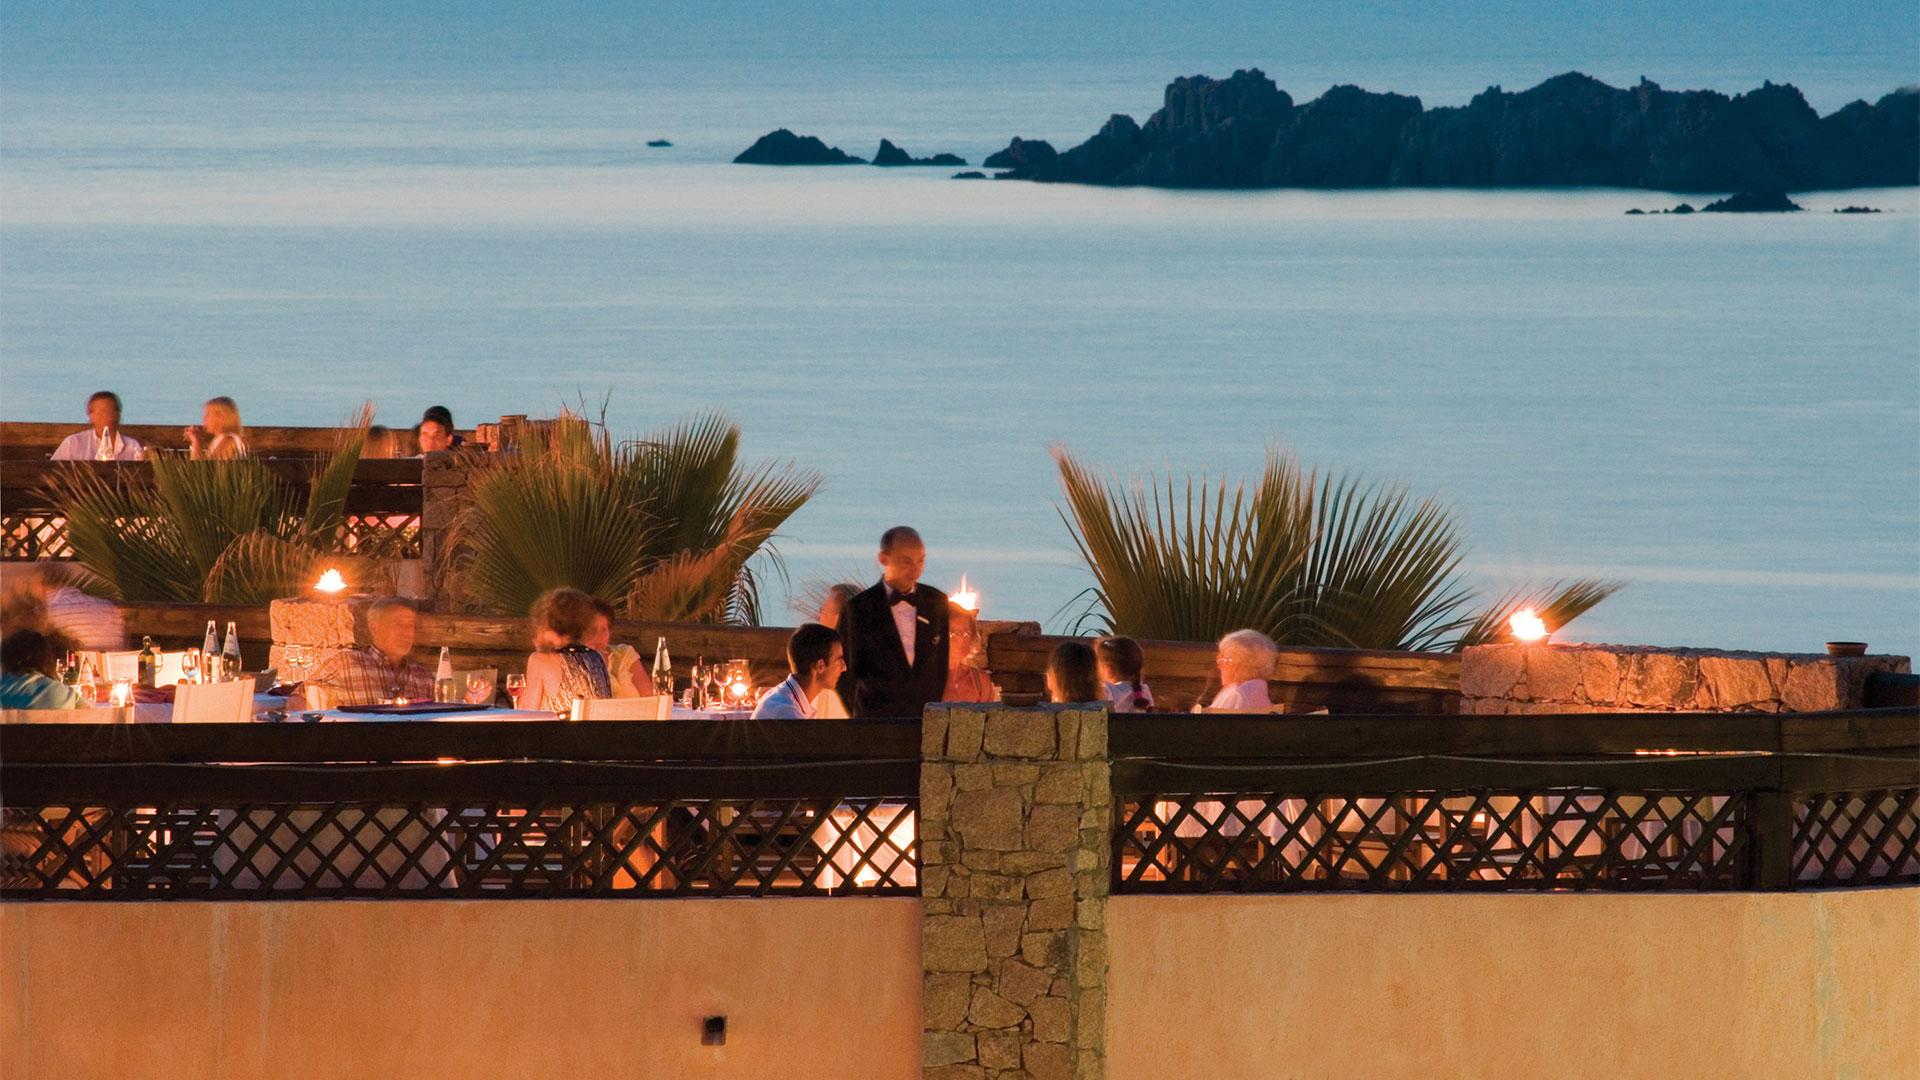 hotel-marinedda-slider-ristoranti-tramonto-mare-sardegna-isola-rossa-1